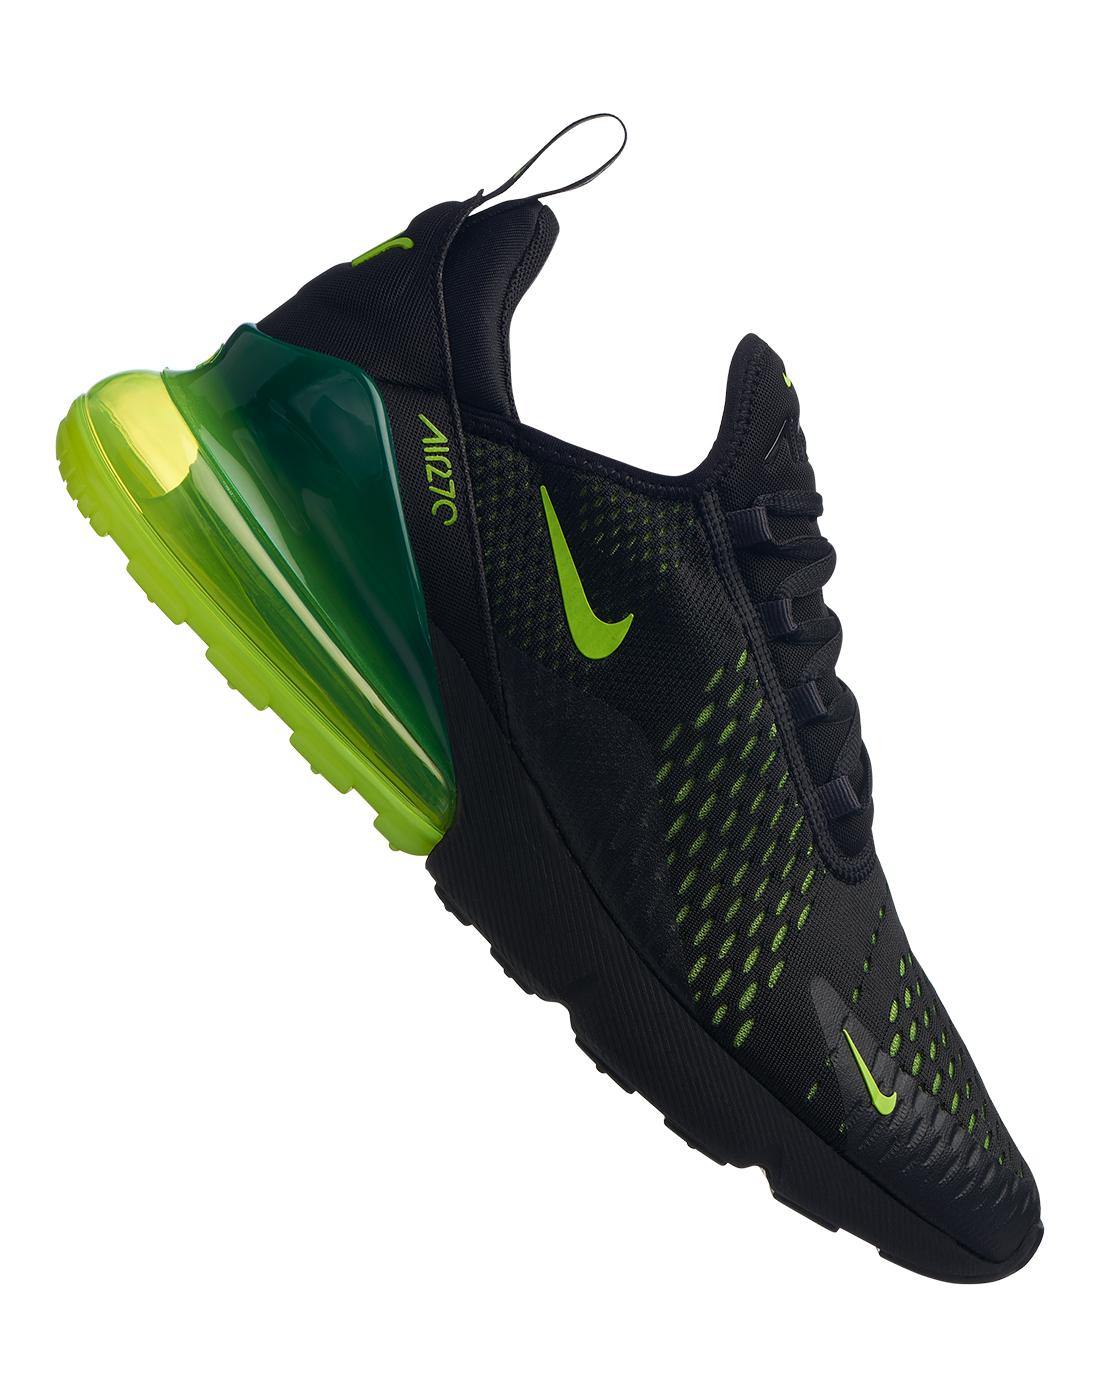 77018608c9 Men's Black & Neon Green Nike Air Max 270 | Life Style Sports